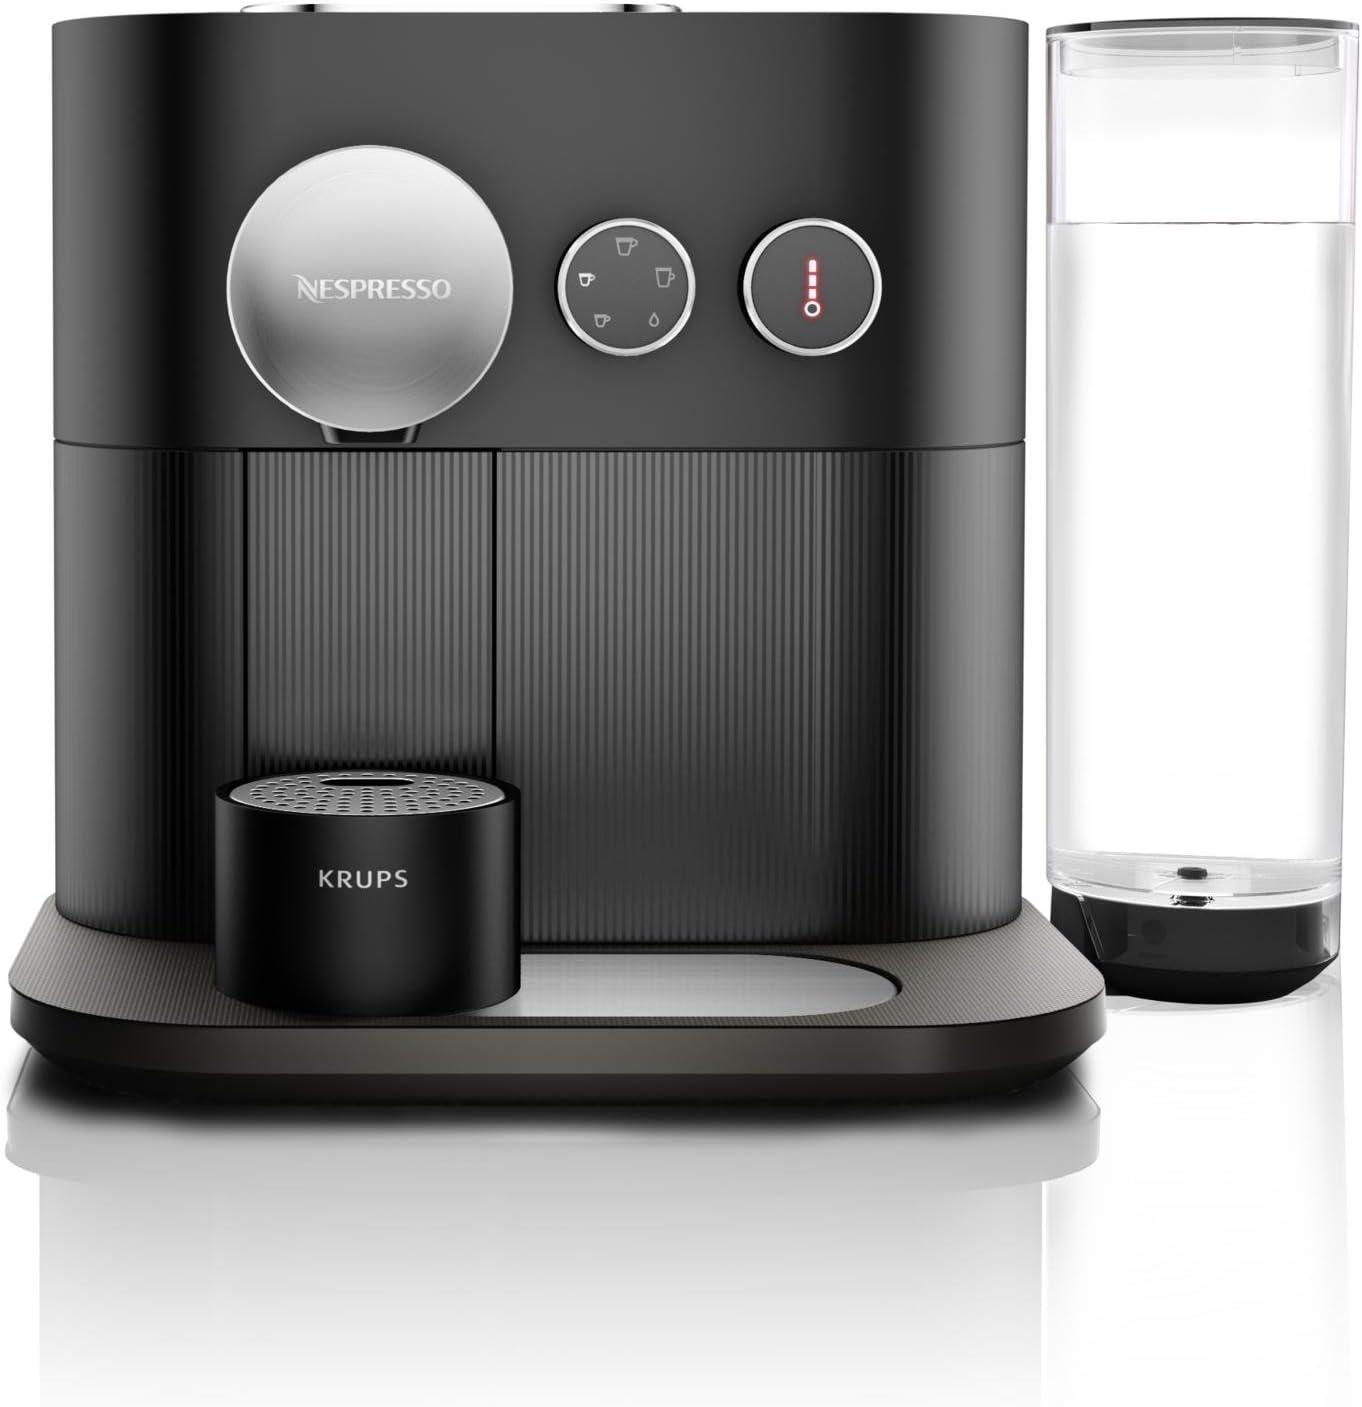 Krups Nespresso yy2794fd Expert - Cafetera eléctrica, Negro: Amazon.es: Hogar